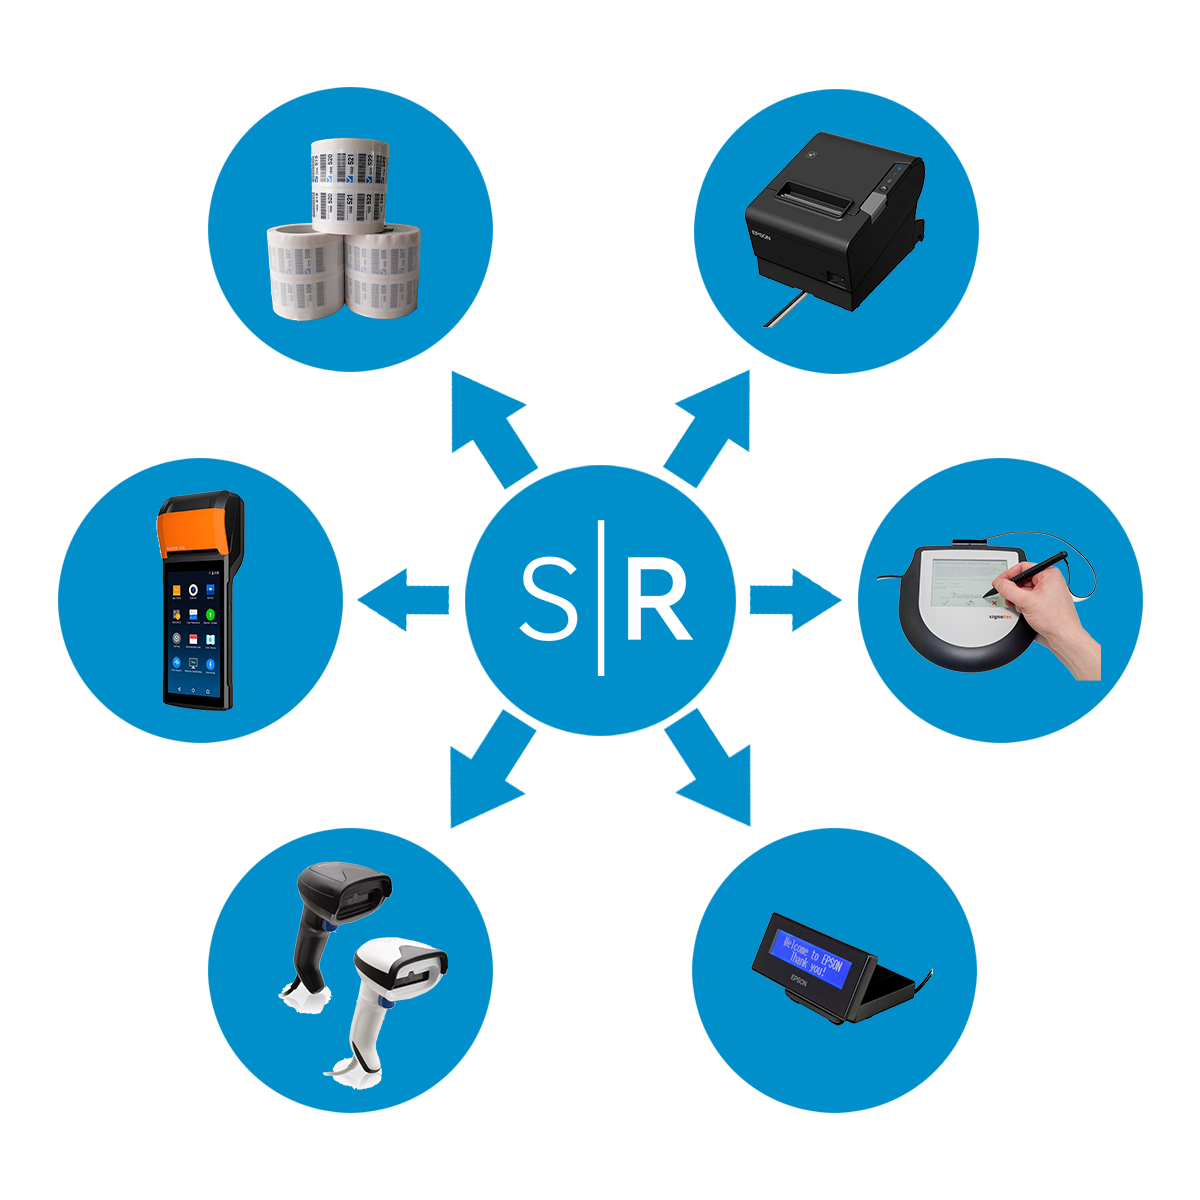 sr_rental_produkte_hardware_blue_logo